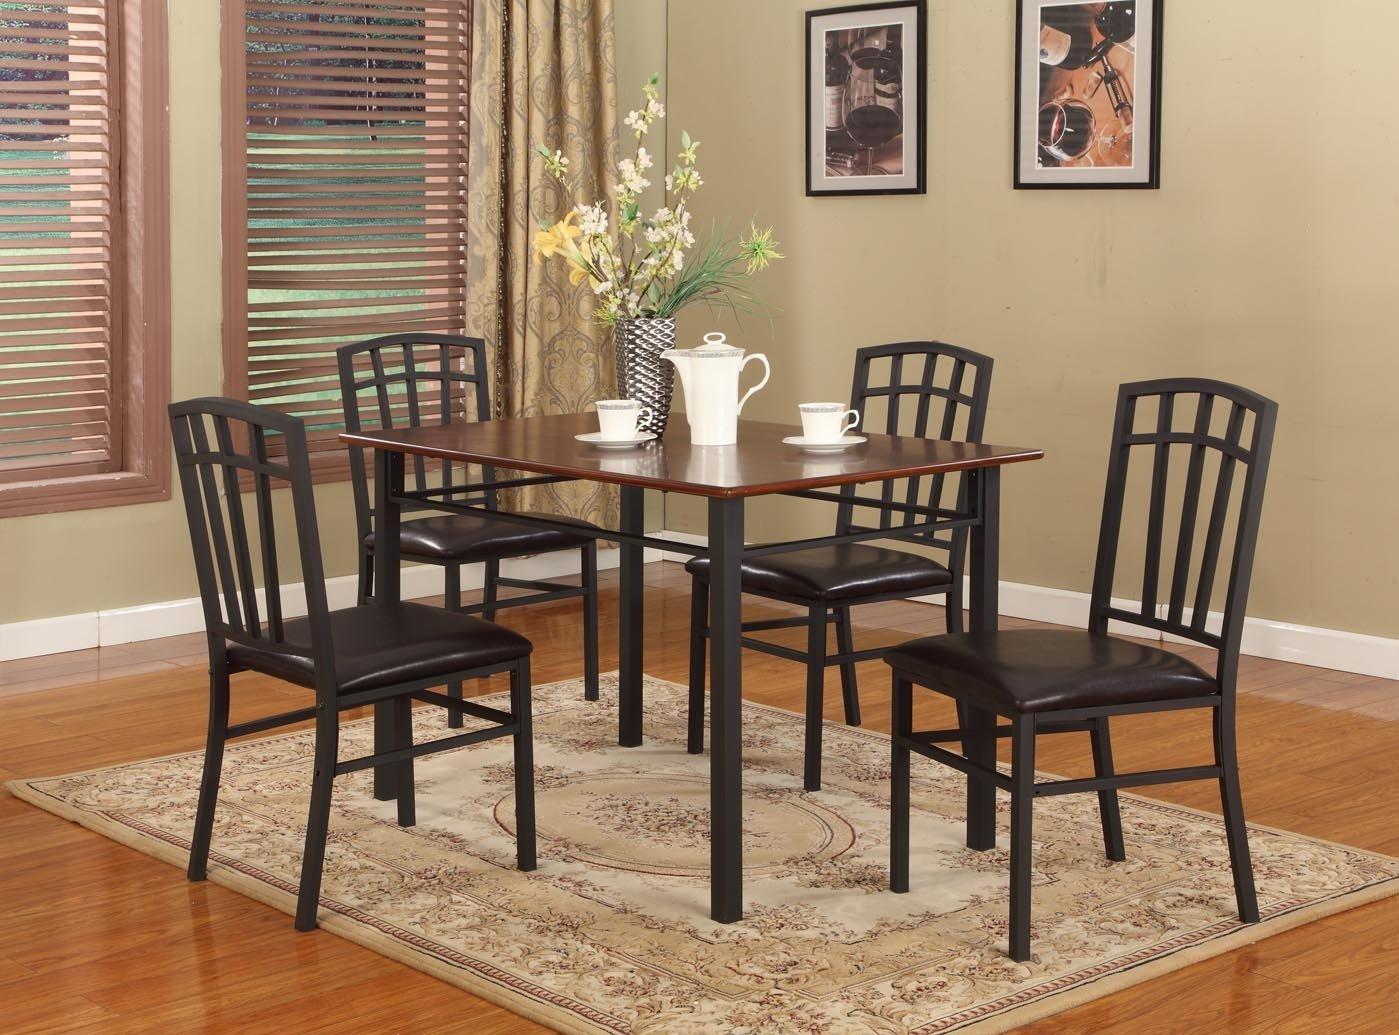 Amazon 5 PC Black Walnut Finish Wood & Metal Dining Room